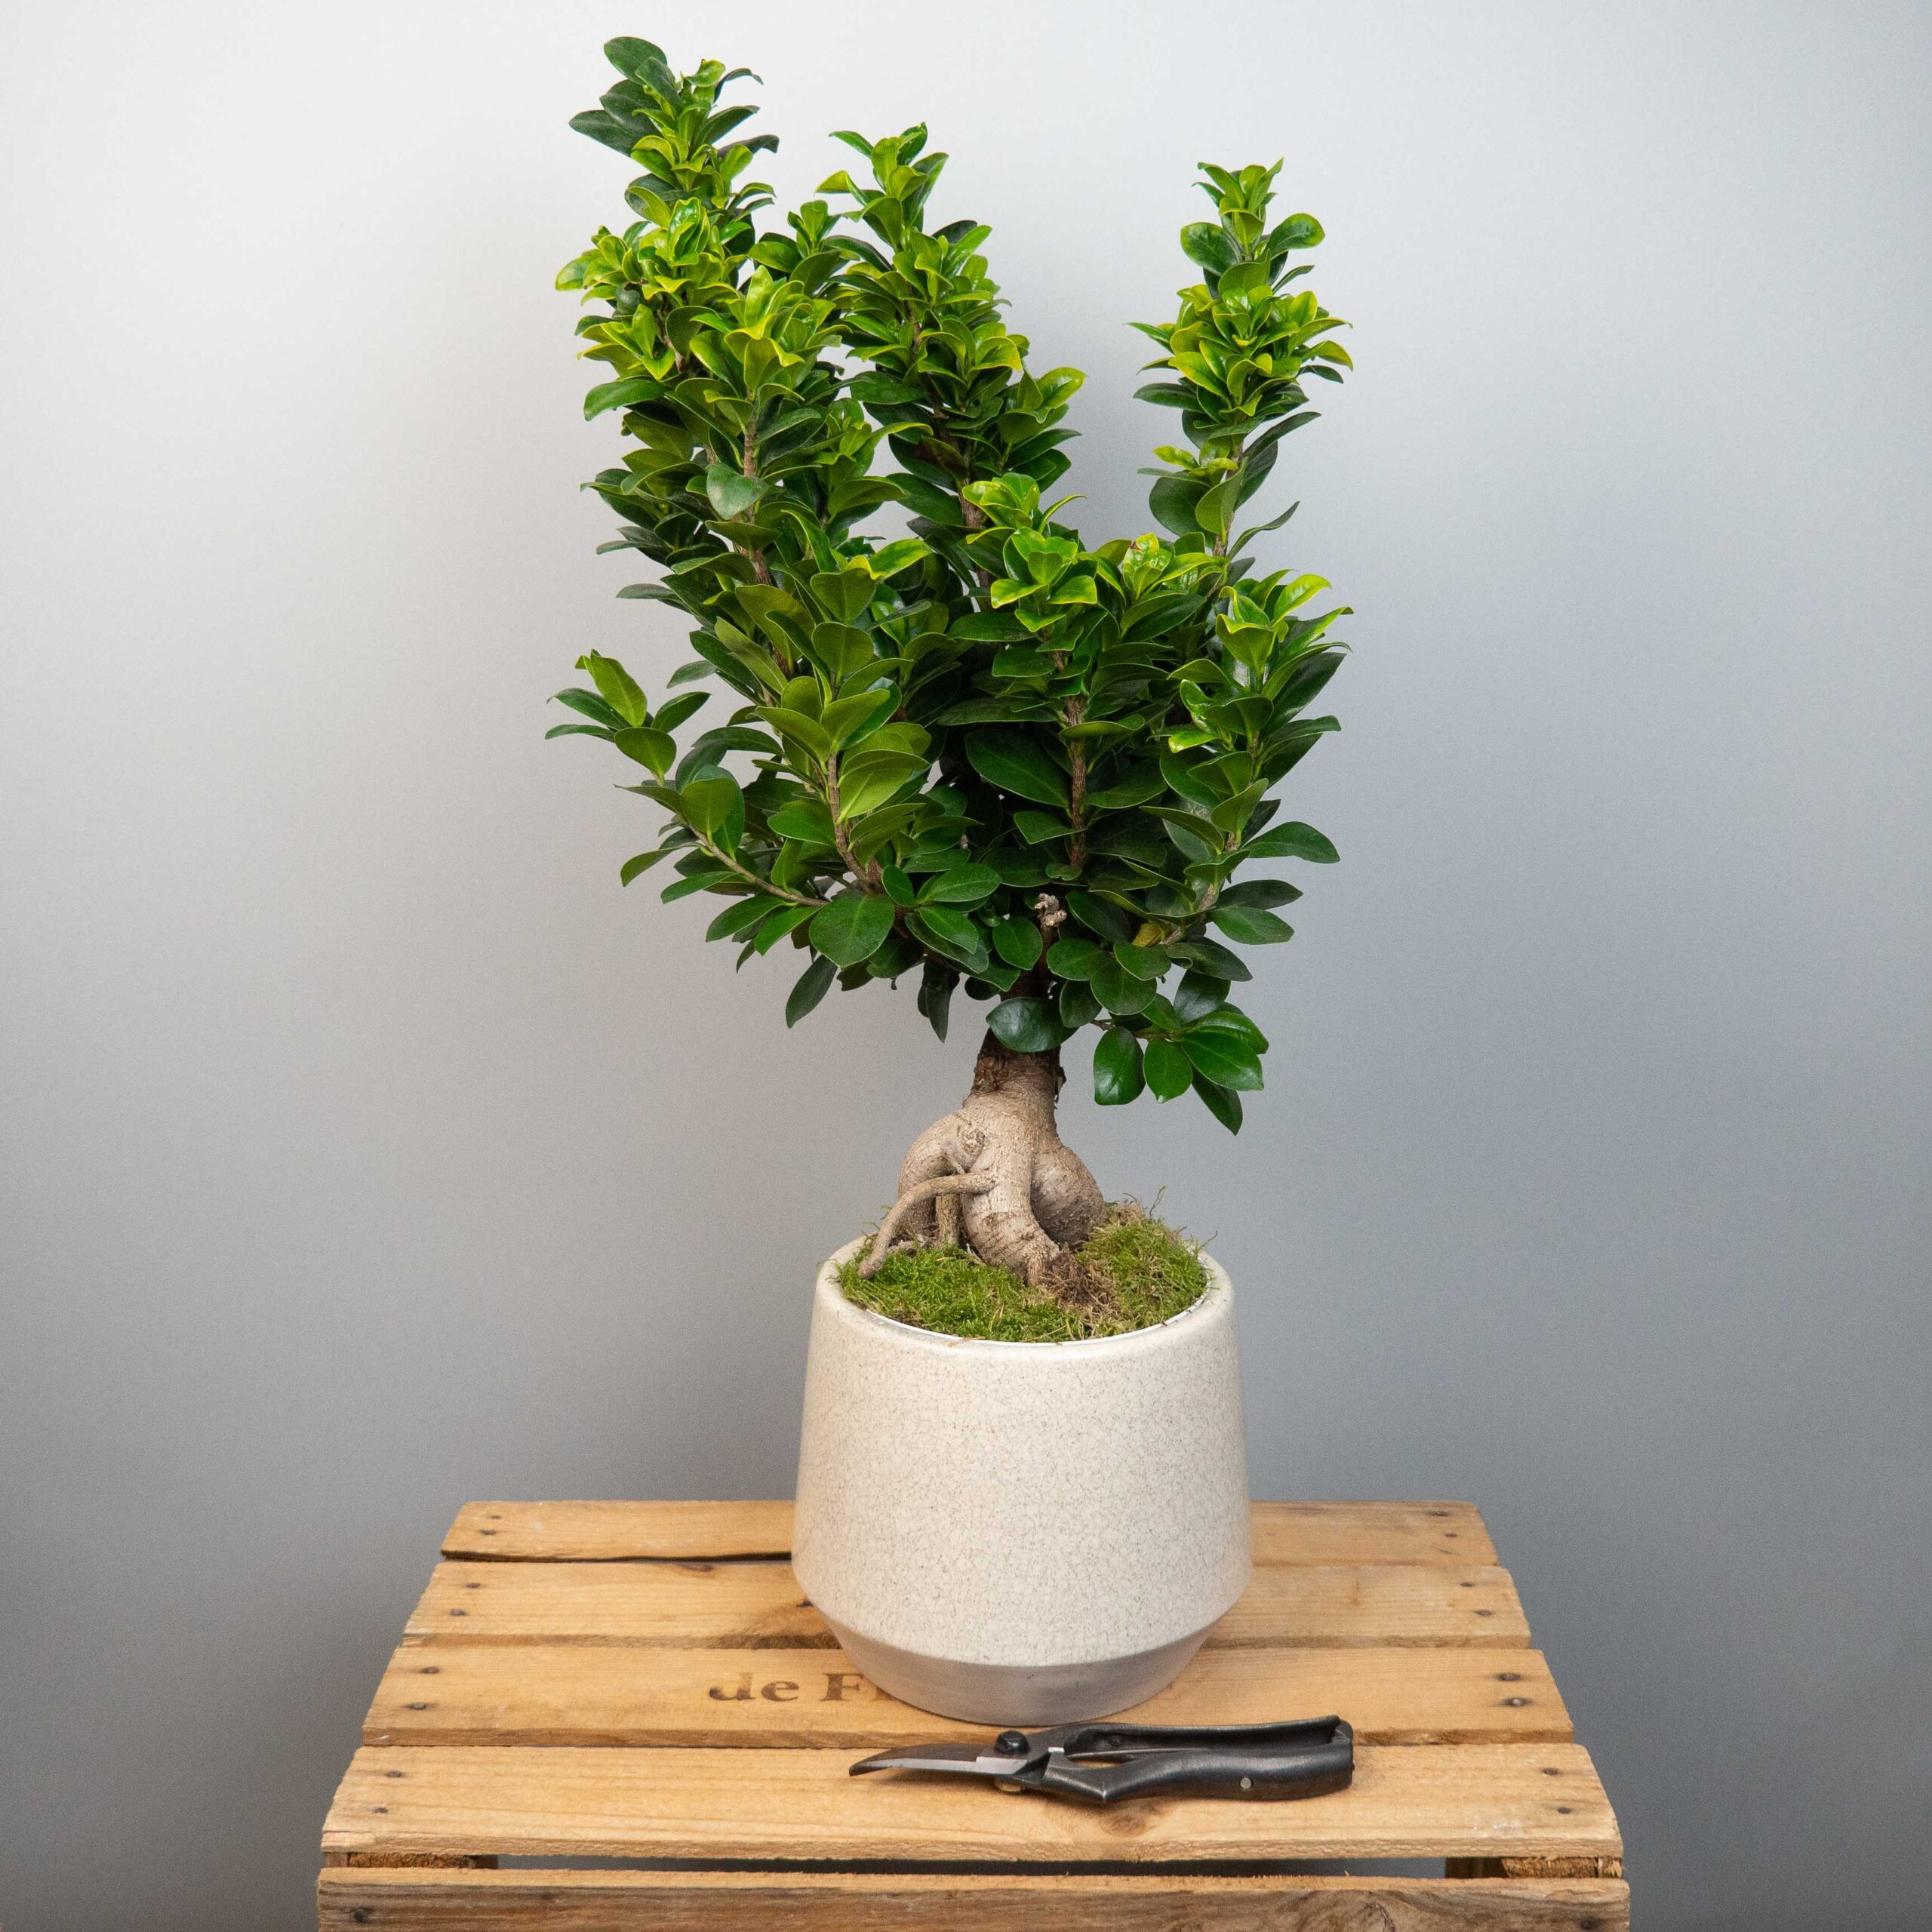 plante-verte-surprise-55€-atelier-lavarenne-fleuriste-lyon-2